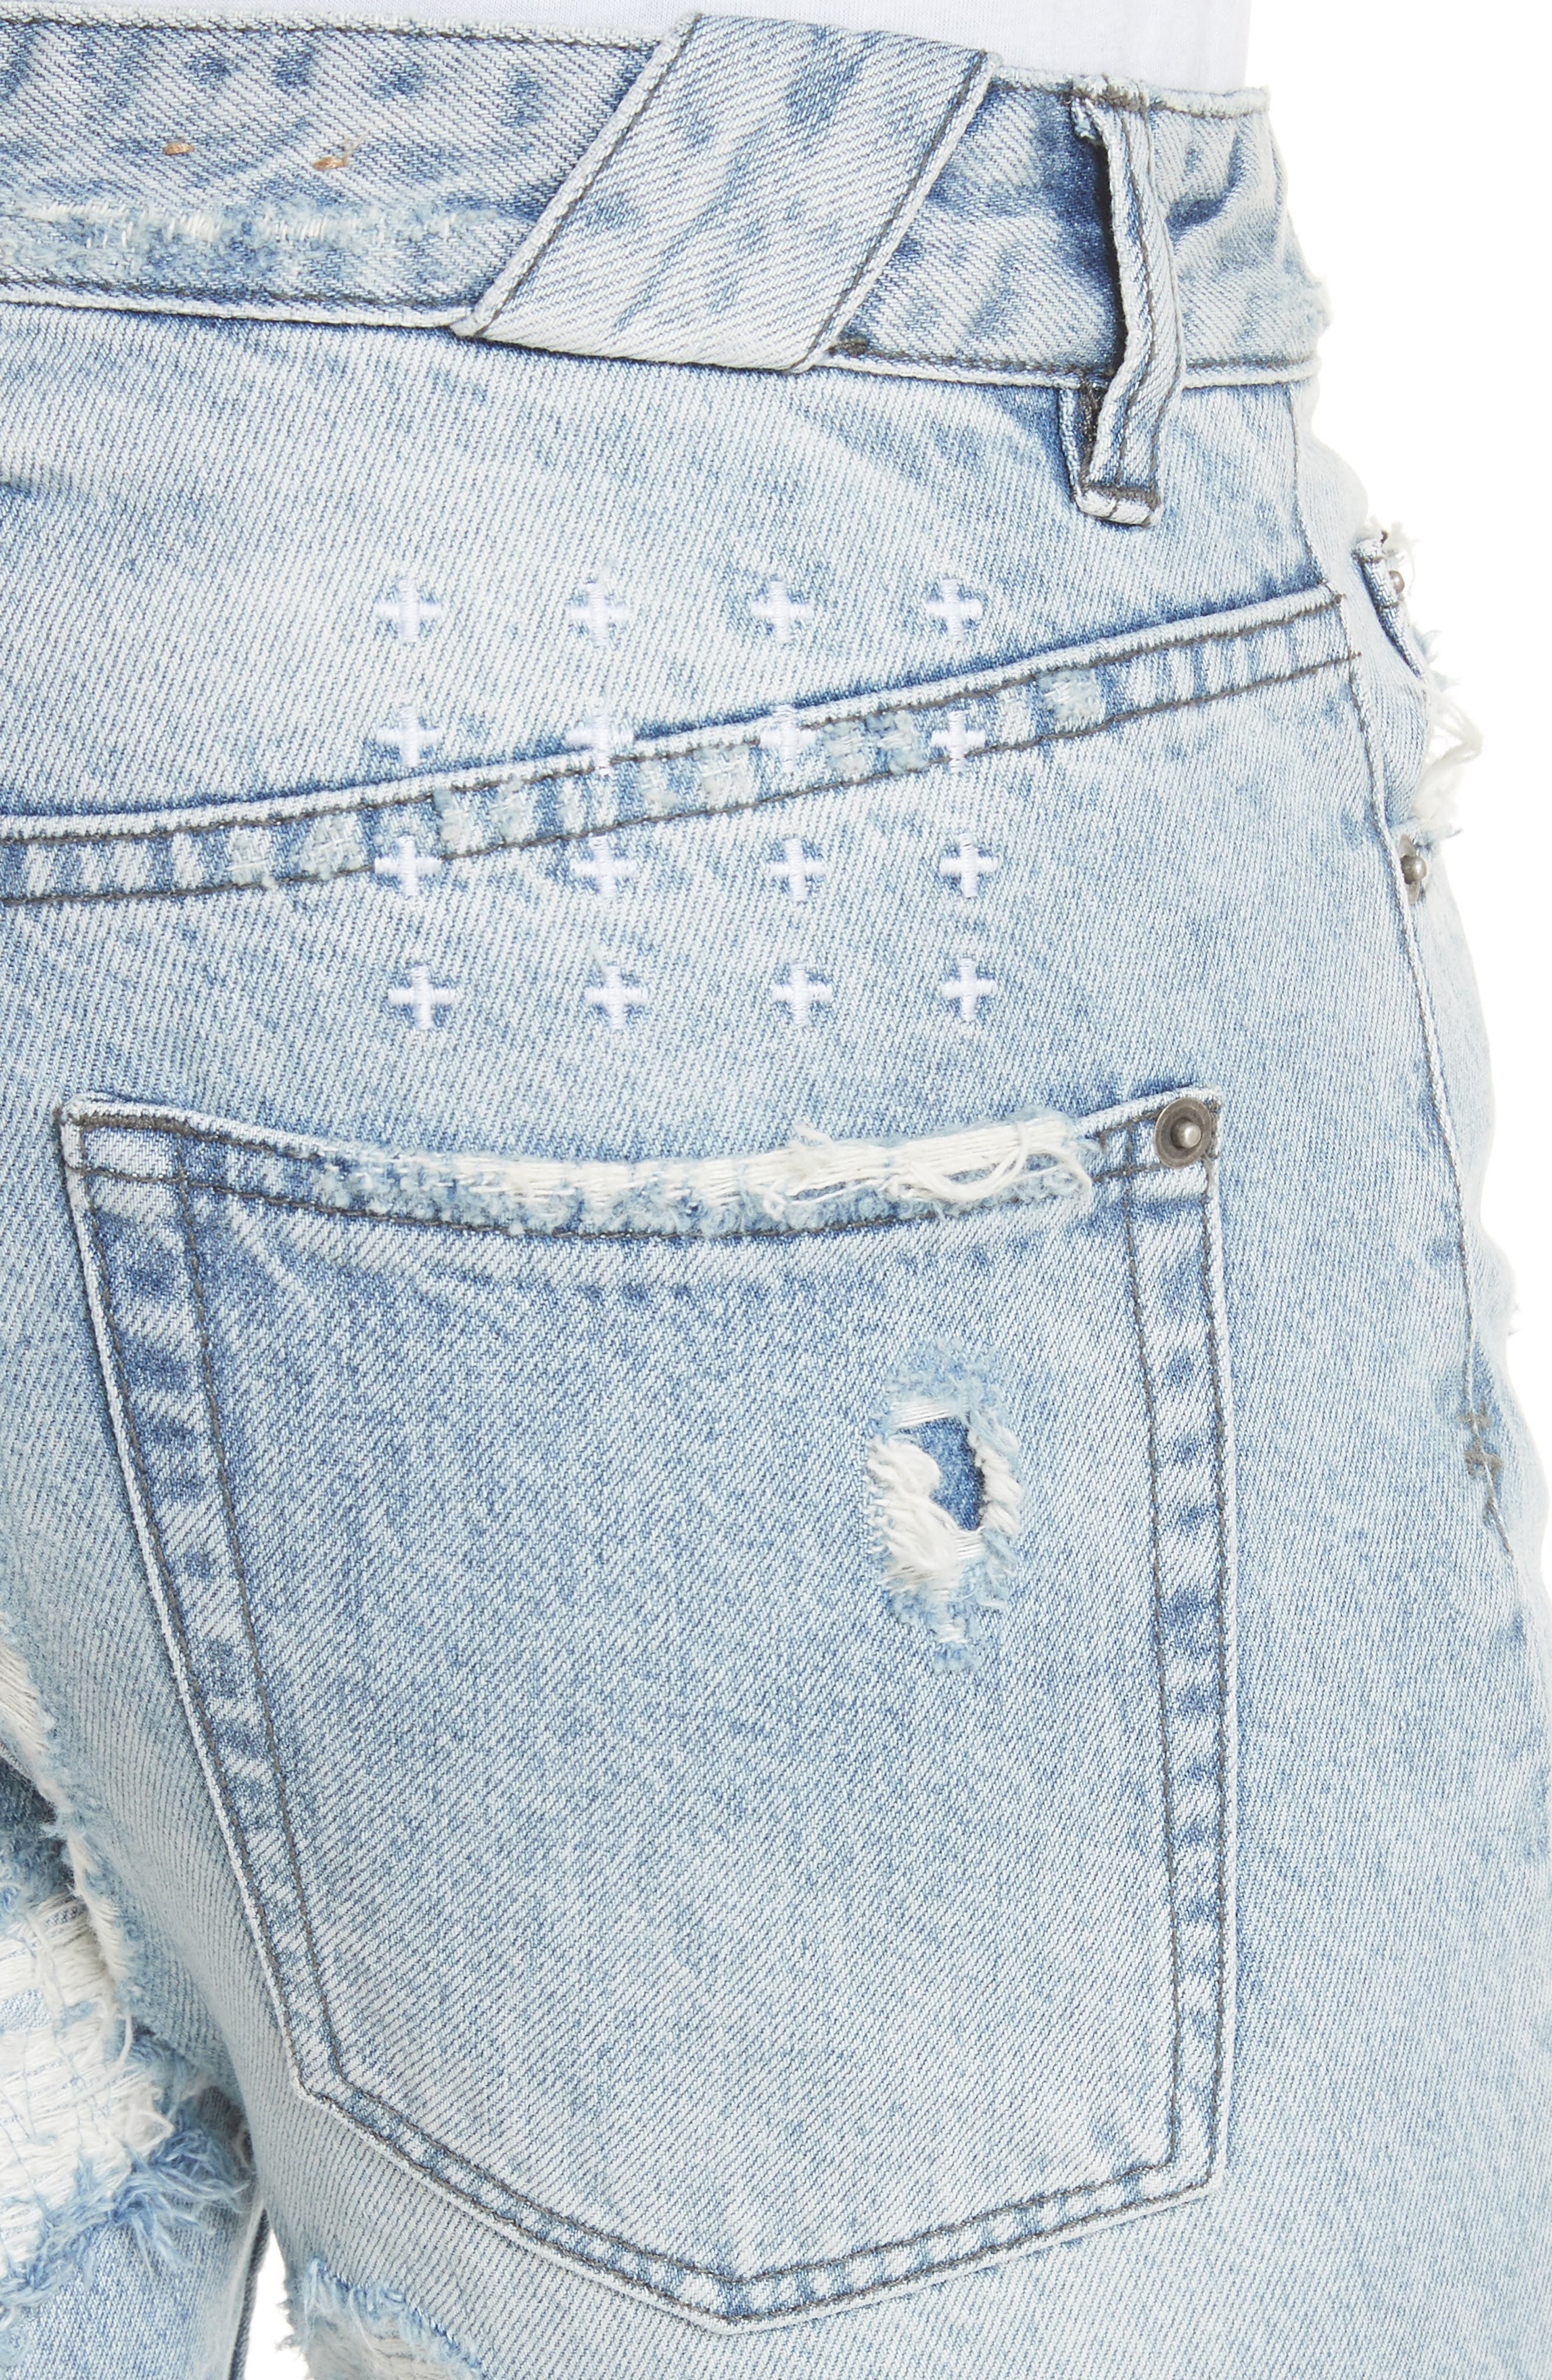 Chitch Tropo Trash Jeans,                             Alternate thumbnail 4, color,                             400